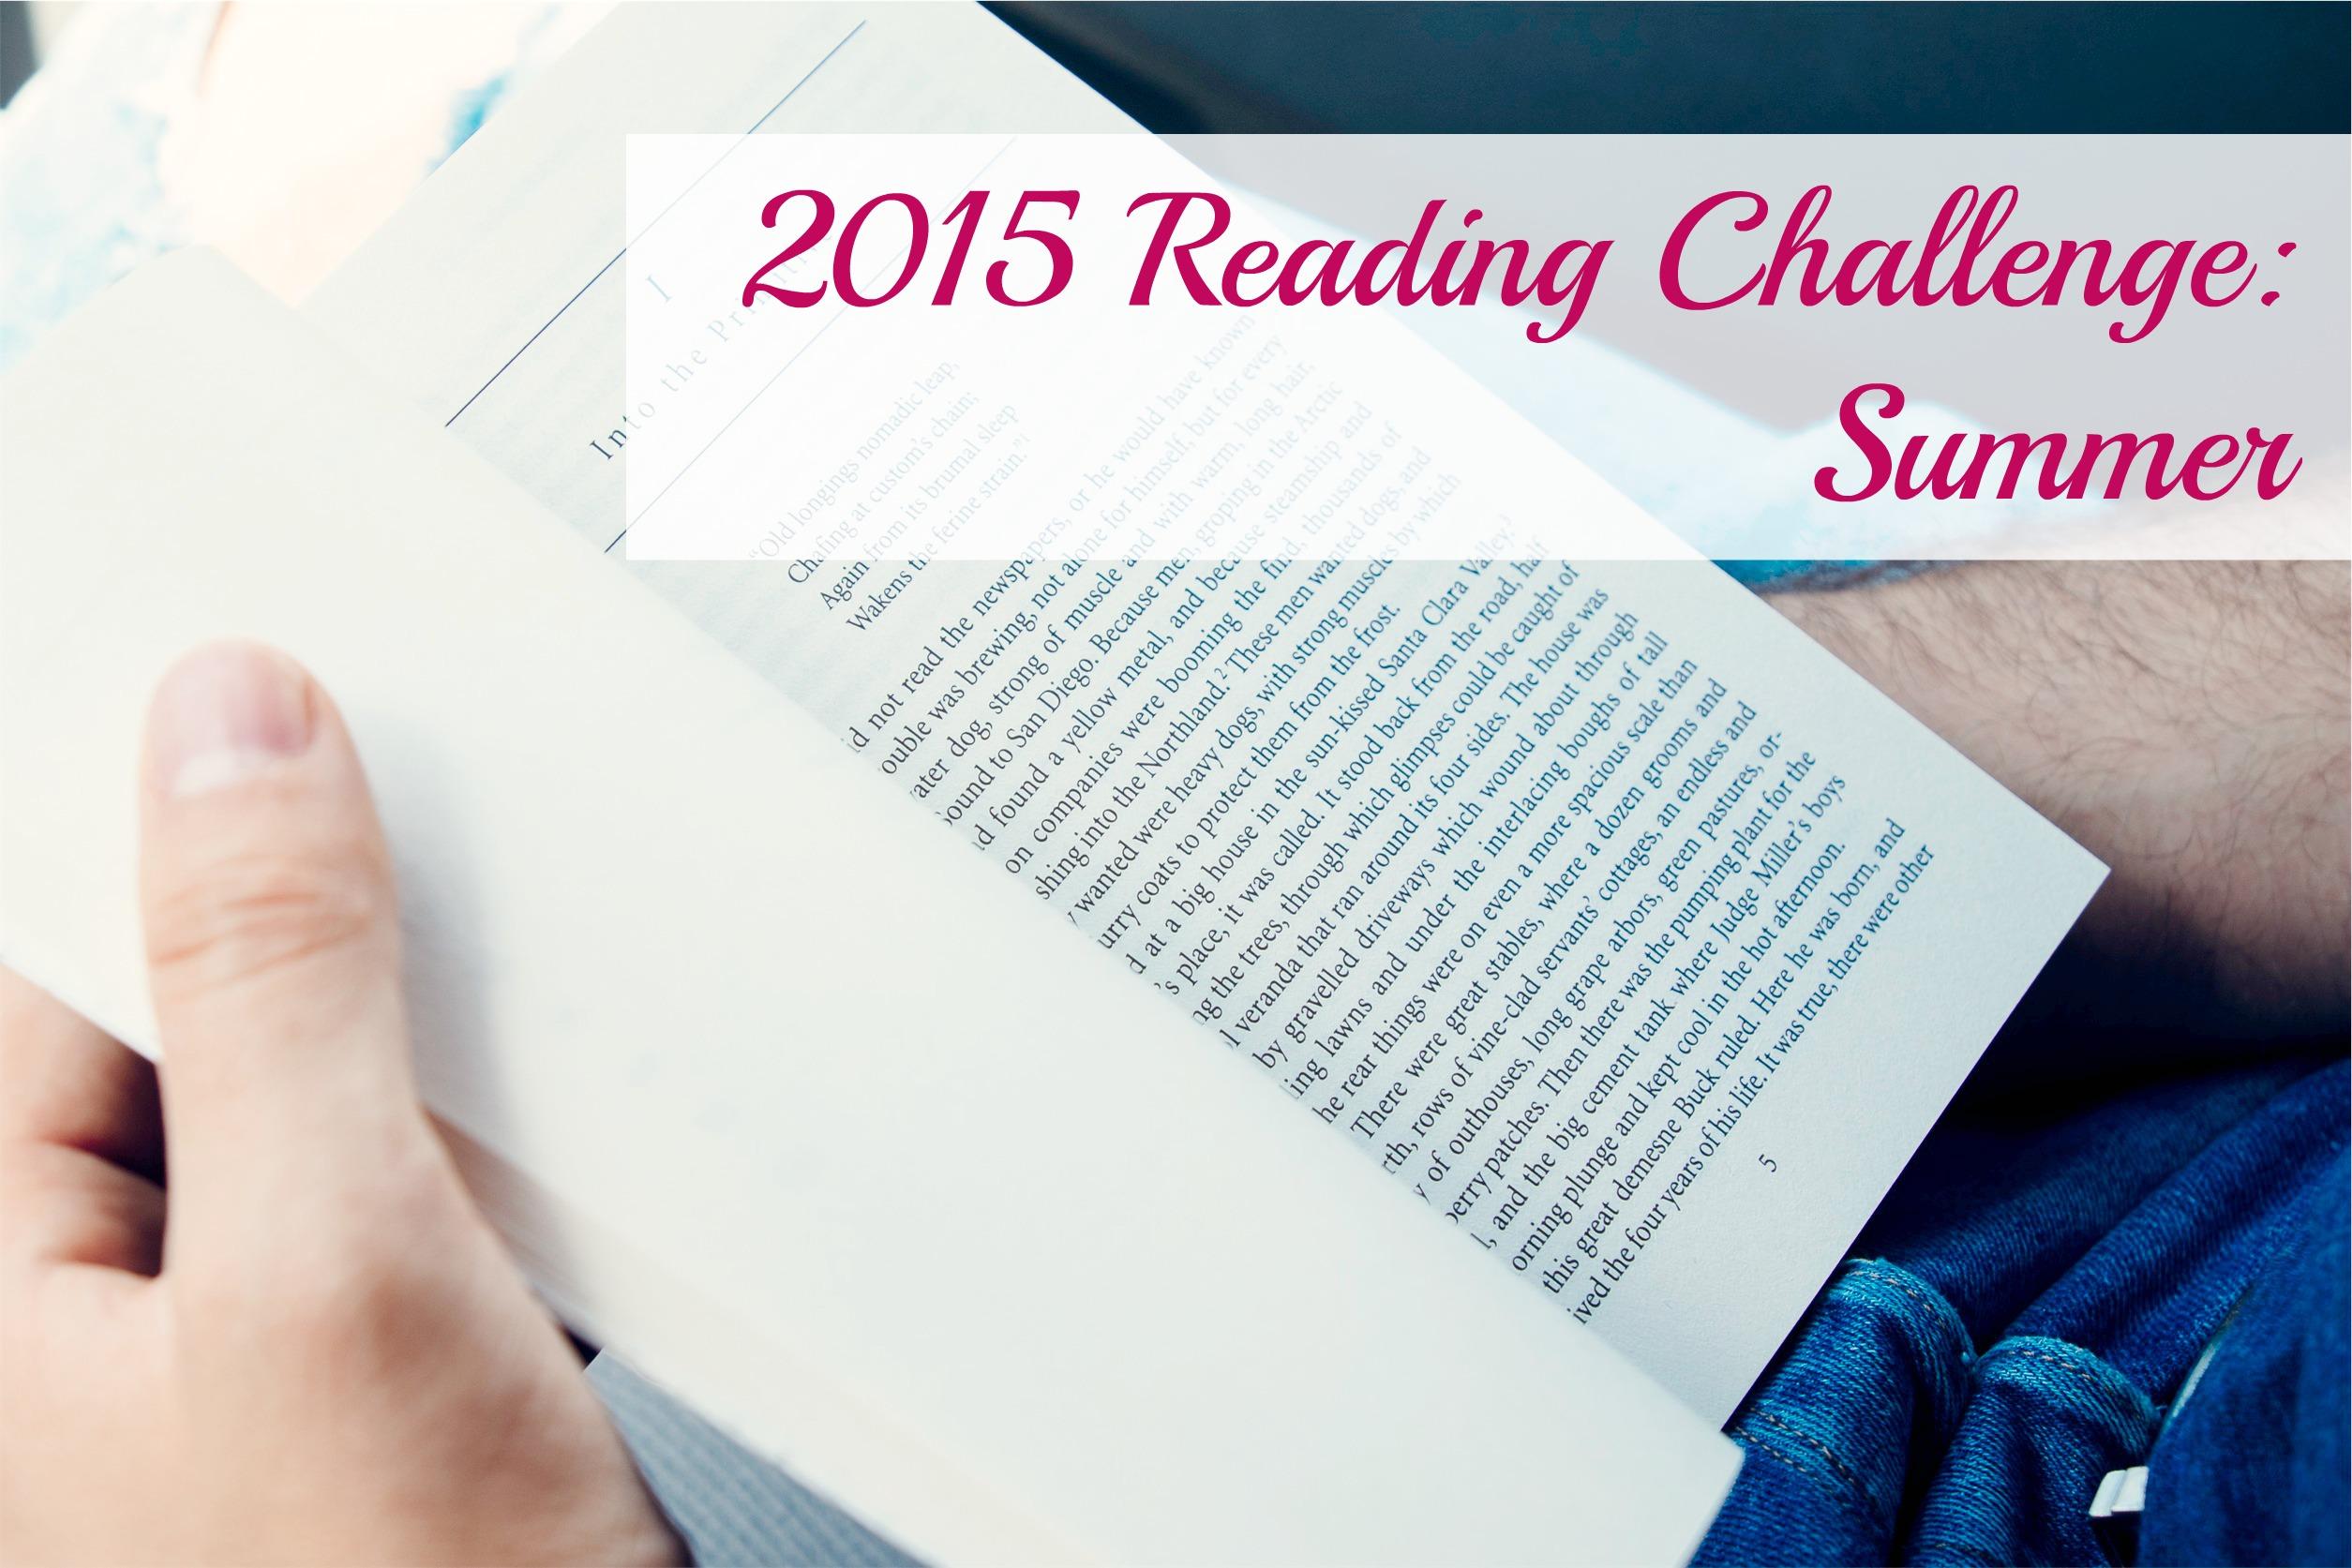 2015 Reading Challenge: Summer